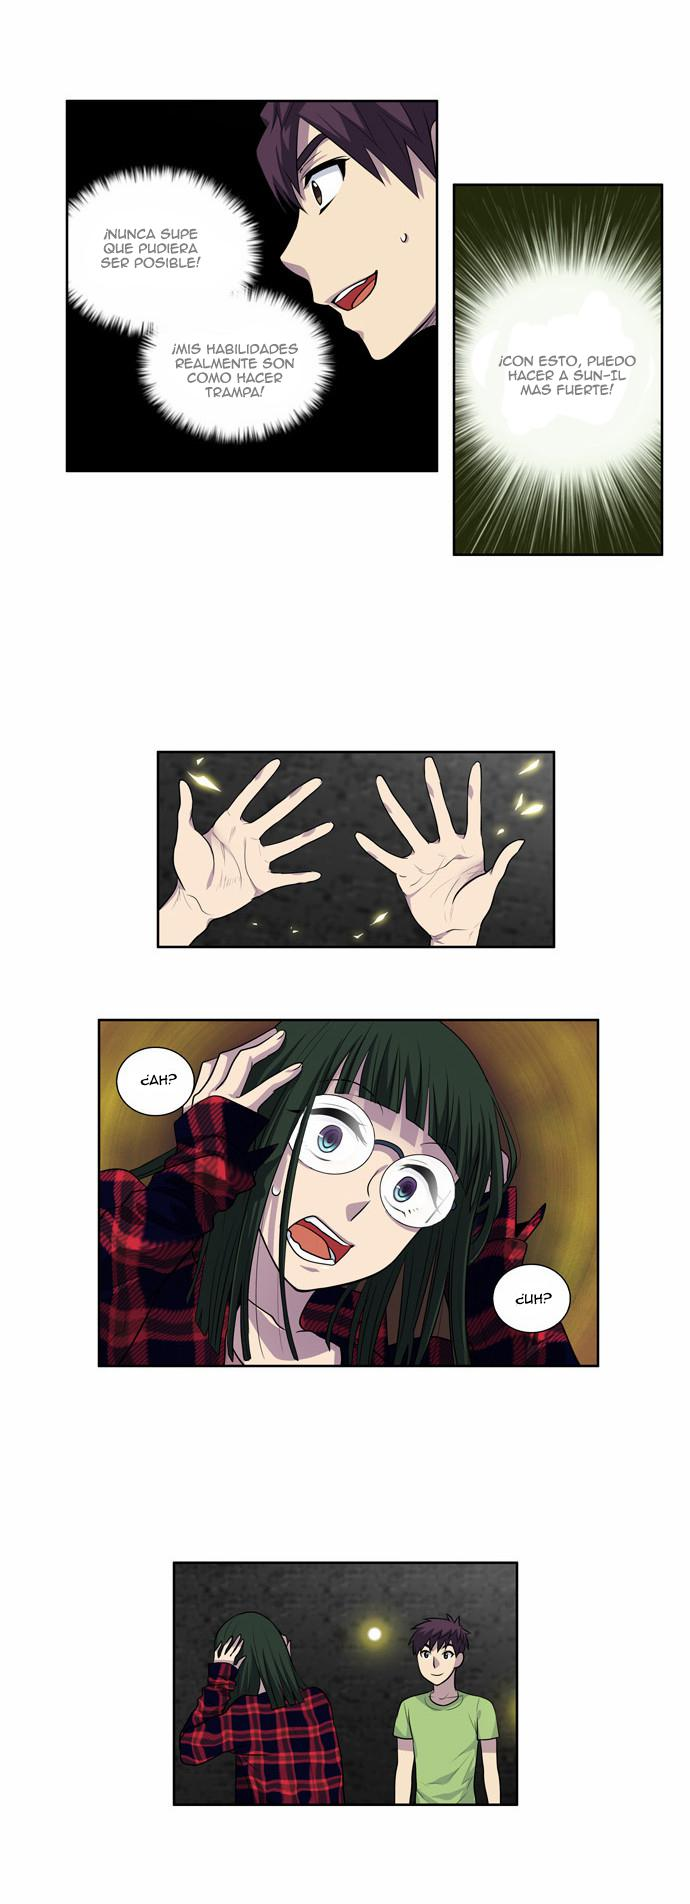 http://c5.ninemanga.com/es_manga/61/1725/423523/96e215fcdd3532d140b8af71e4c73931.jpg Page 5